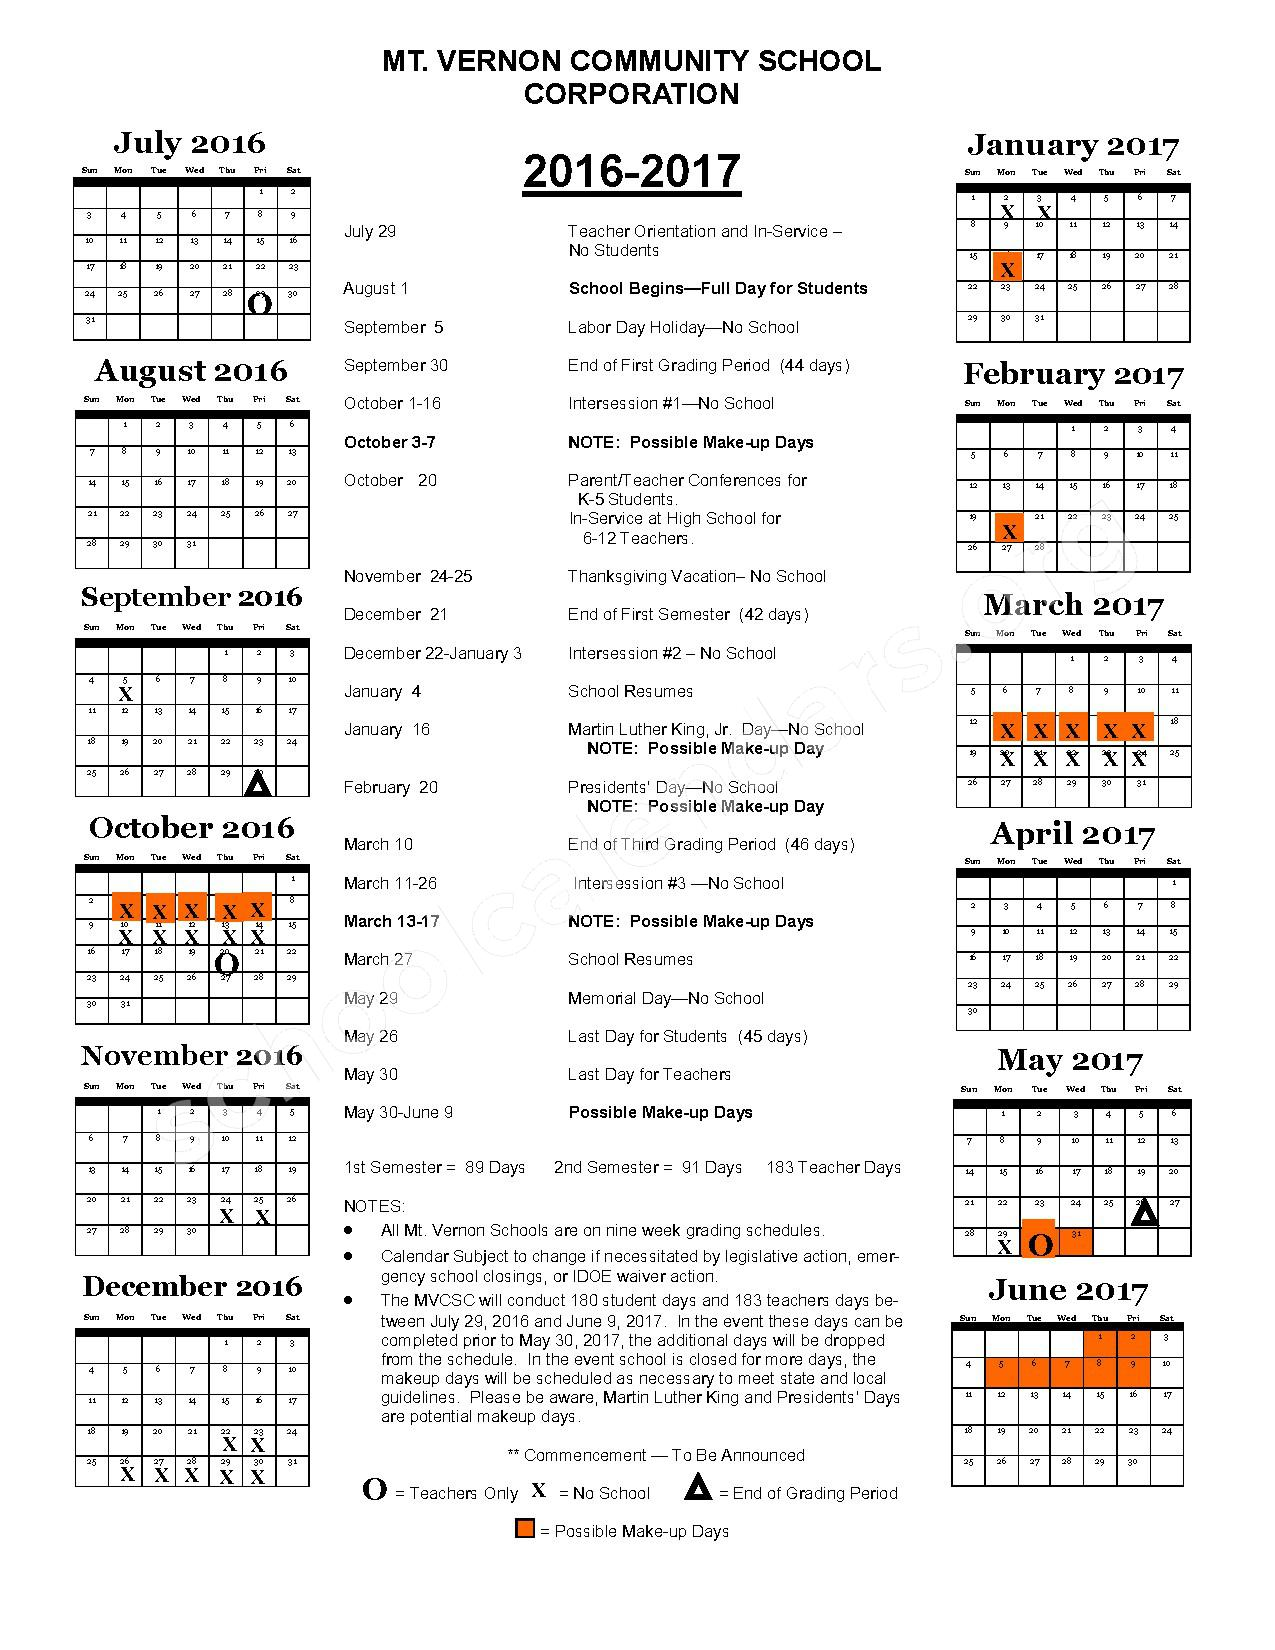 2016 - 2017 District Calendar – Mt Vernon Community School Corporation – page 1